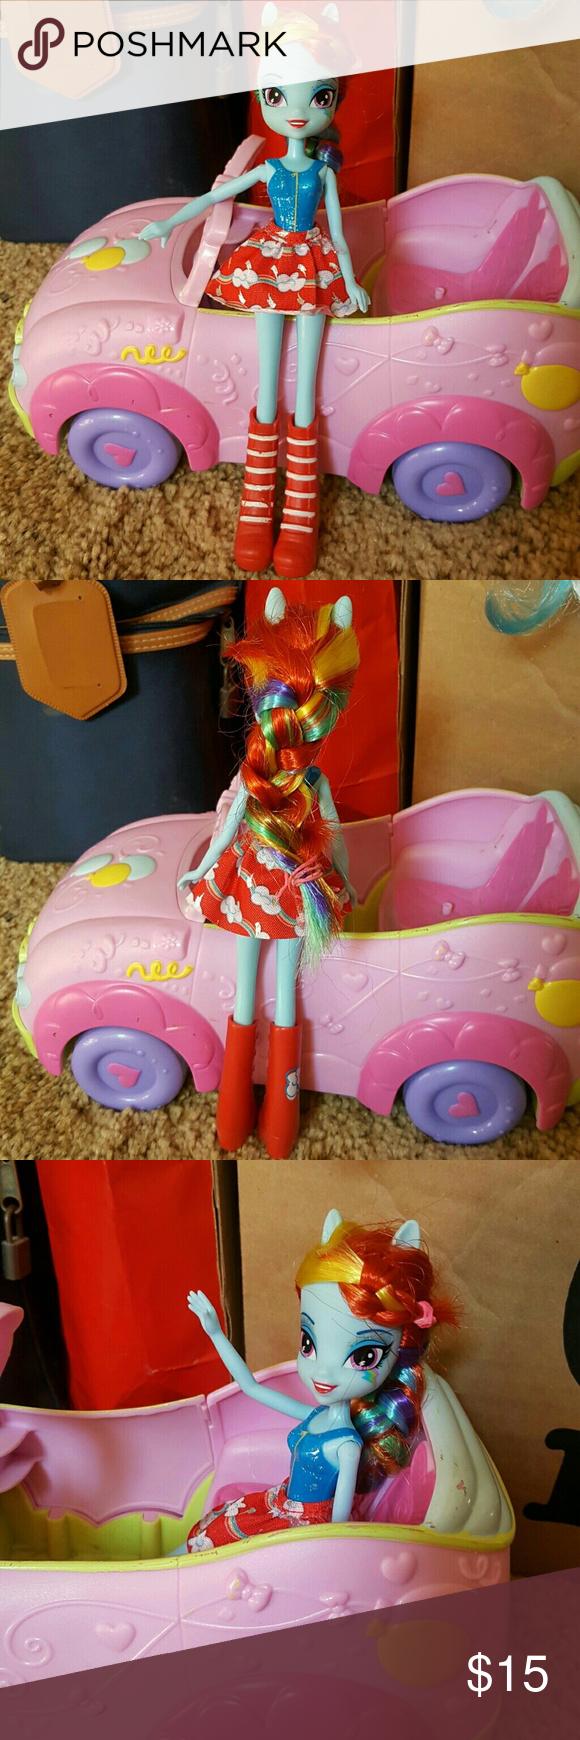 My Little Pony My Posh Closet Closet Pony Dash Dolls